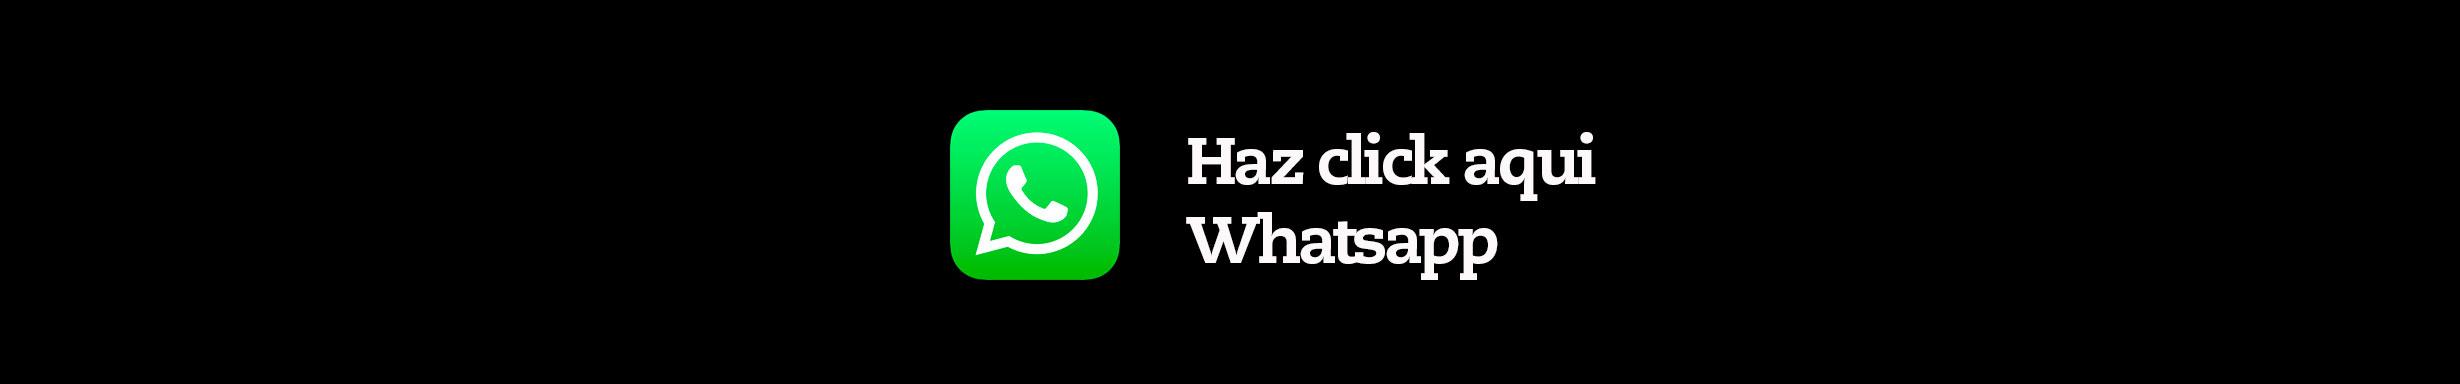 whatsapp-exper.jpg